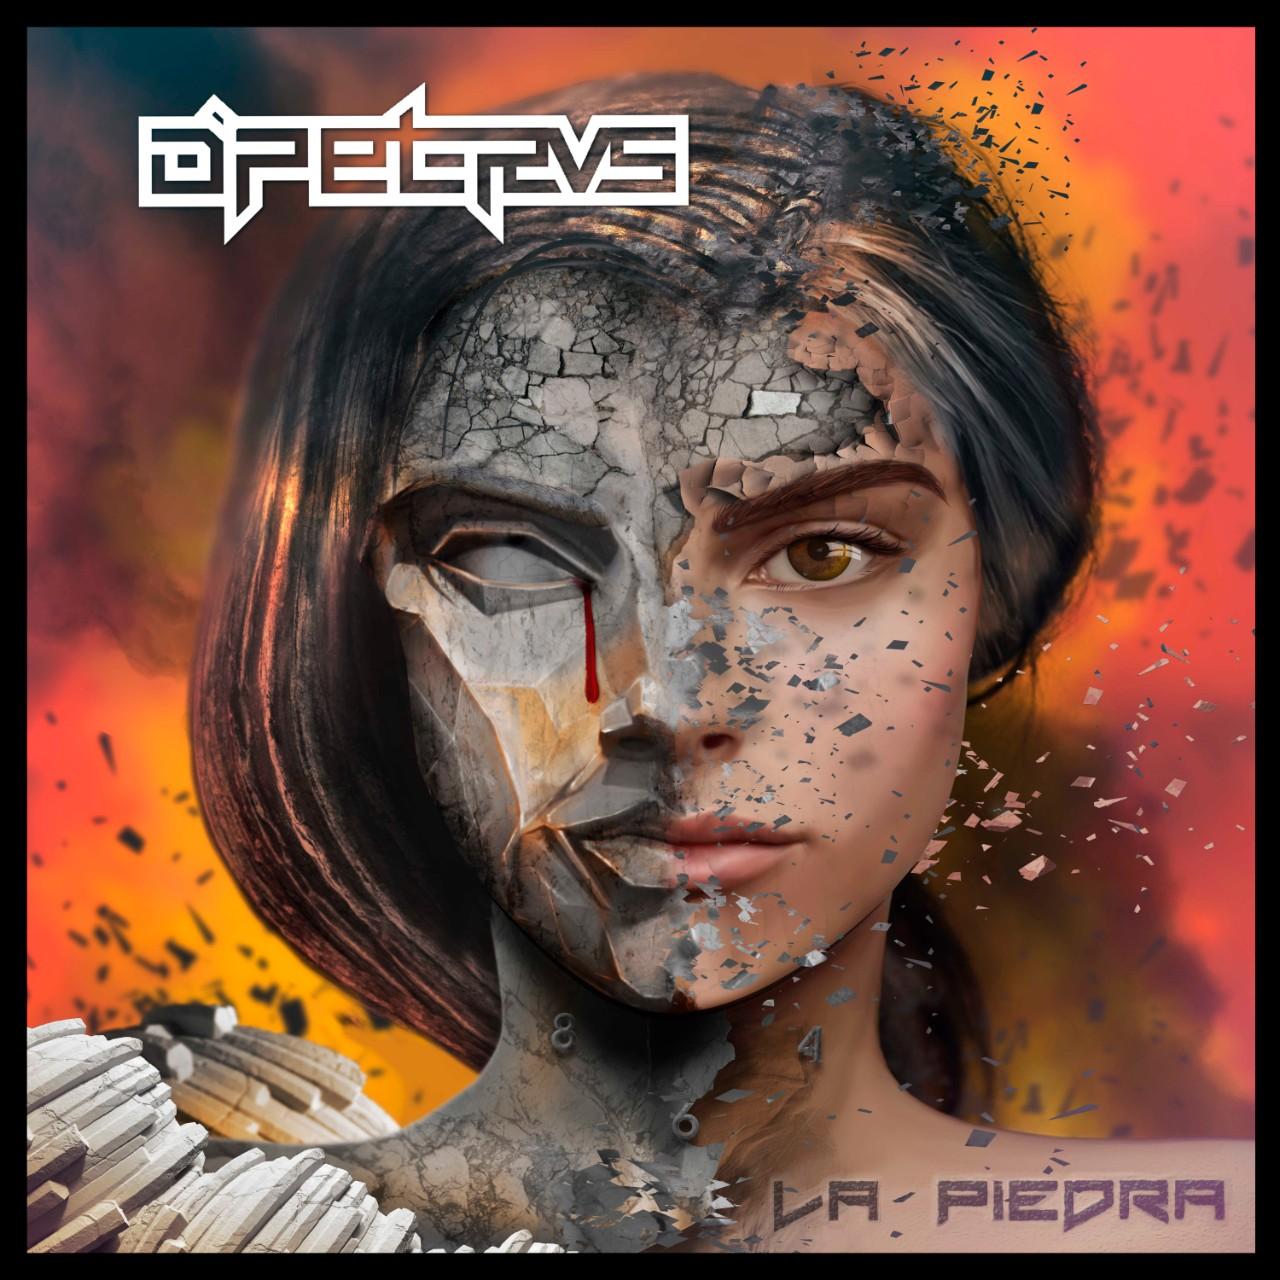 D Petrus – La Piedra EP (2020)